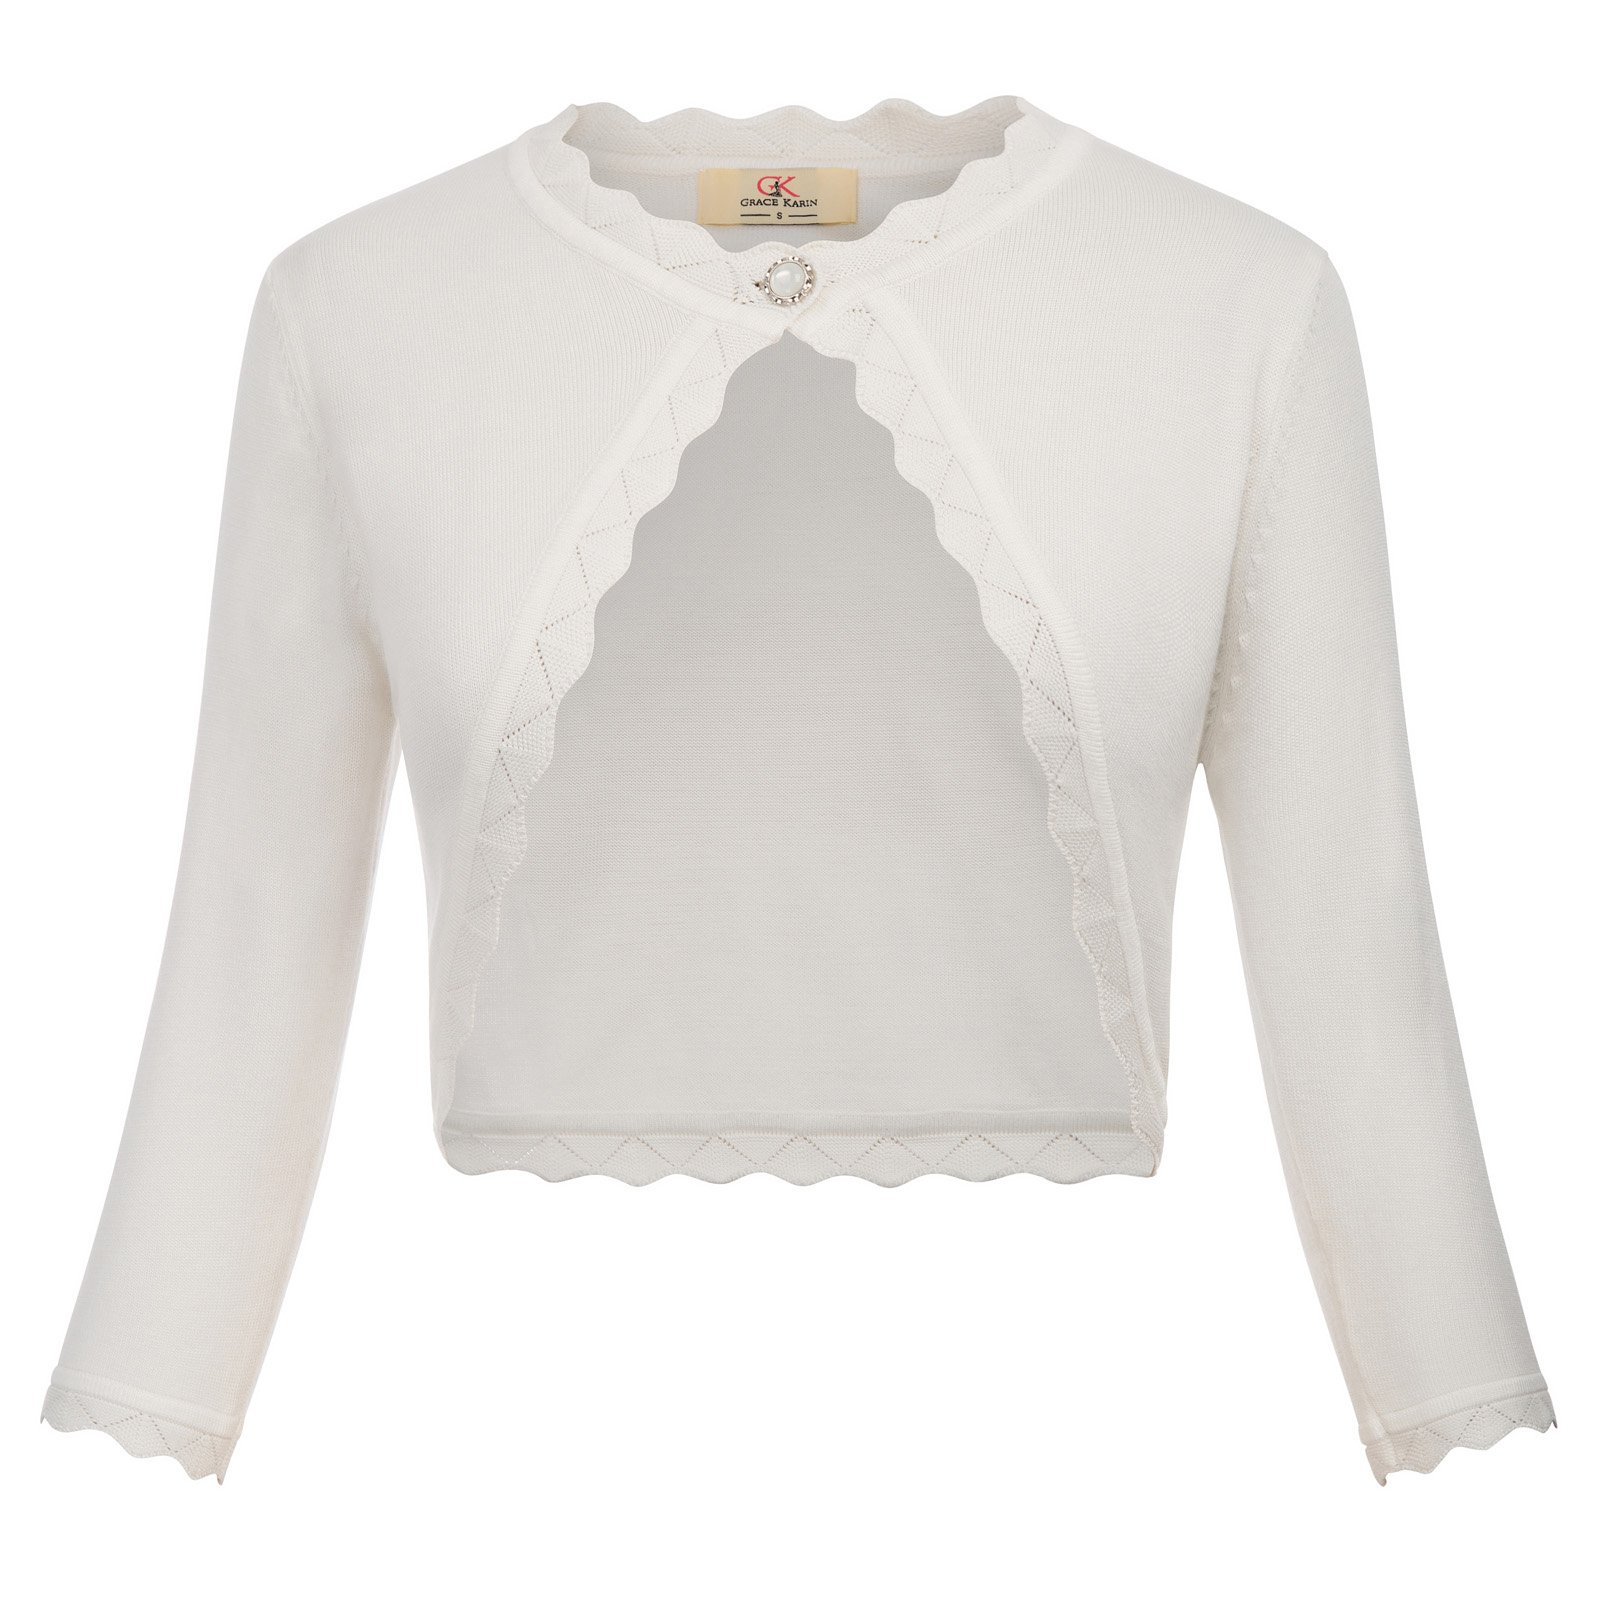 294470df4 GRACE KARIN Women s Classic 3 4 Sleeve Open Front Knit Cropped Bolero  Cardigan product image